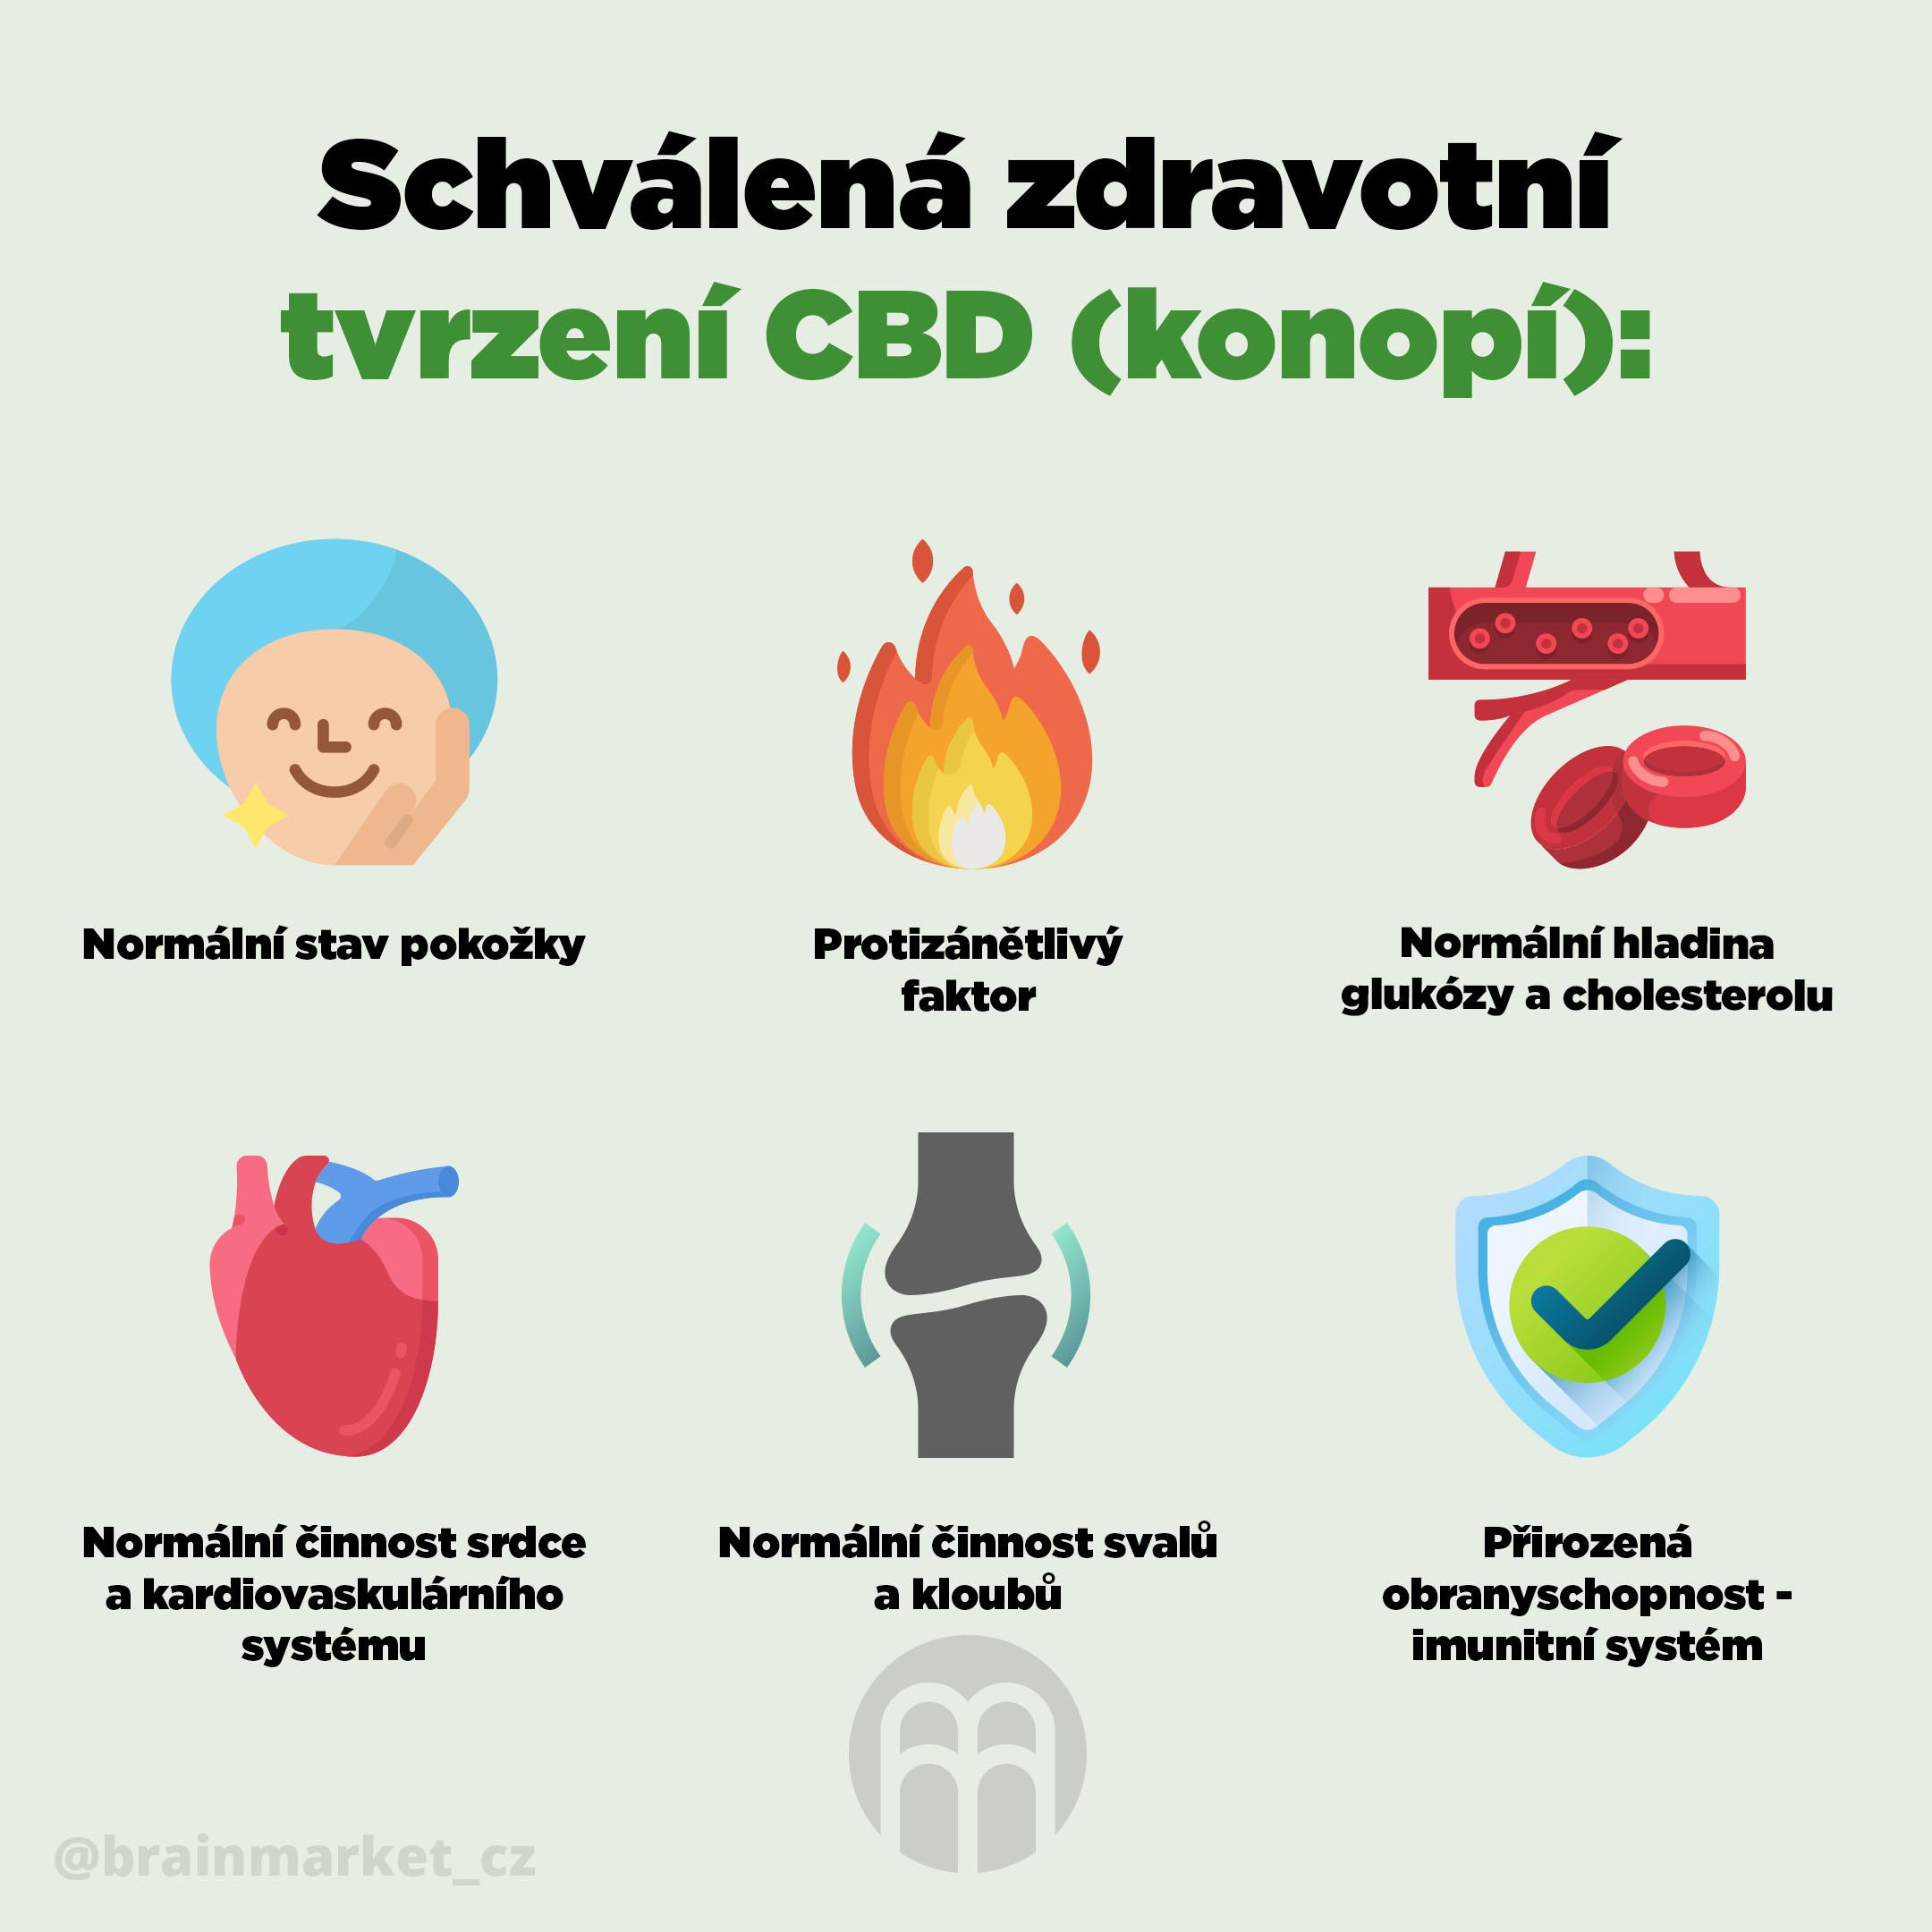 schvalena-zdravotni-tvrzeni-cbd-infografika-brainmarket-cz